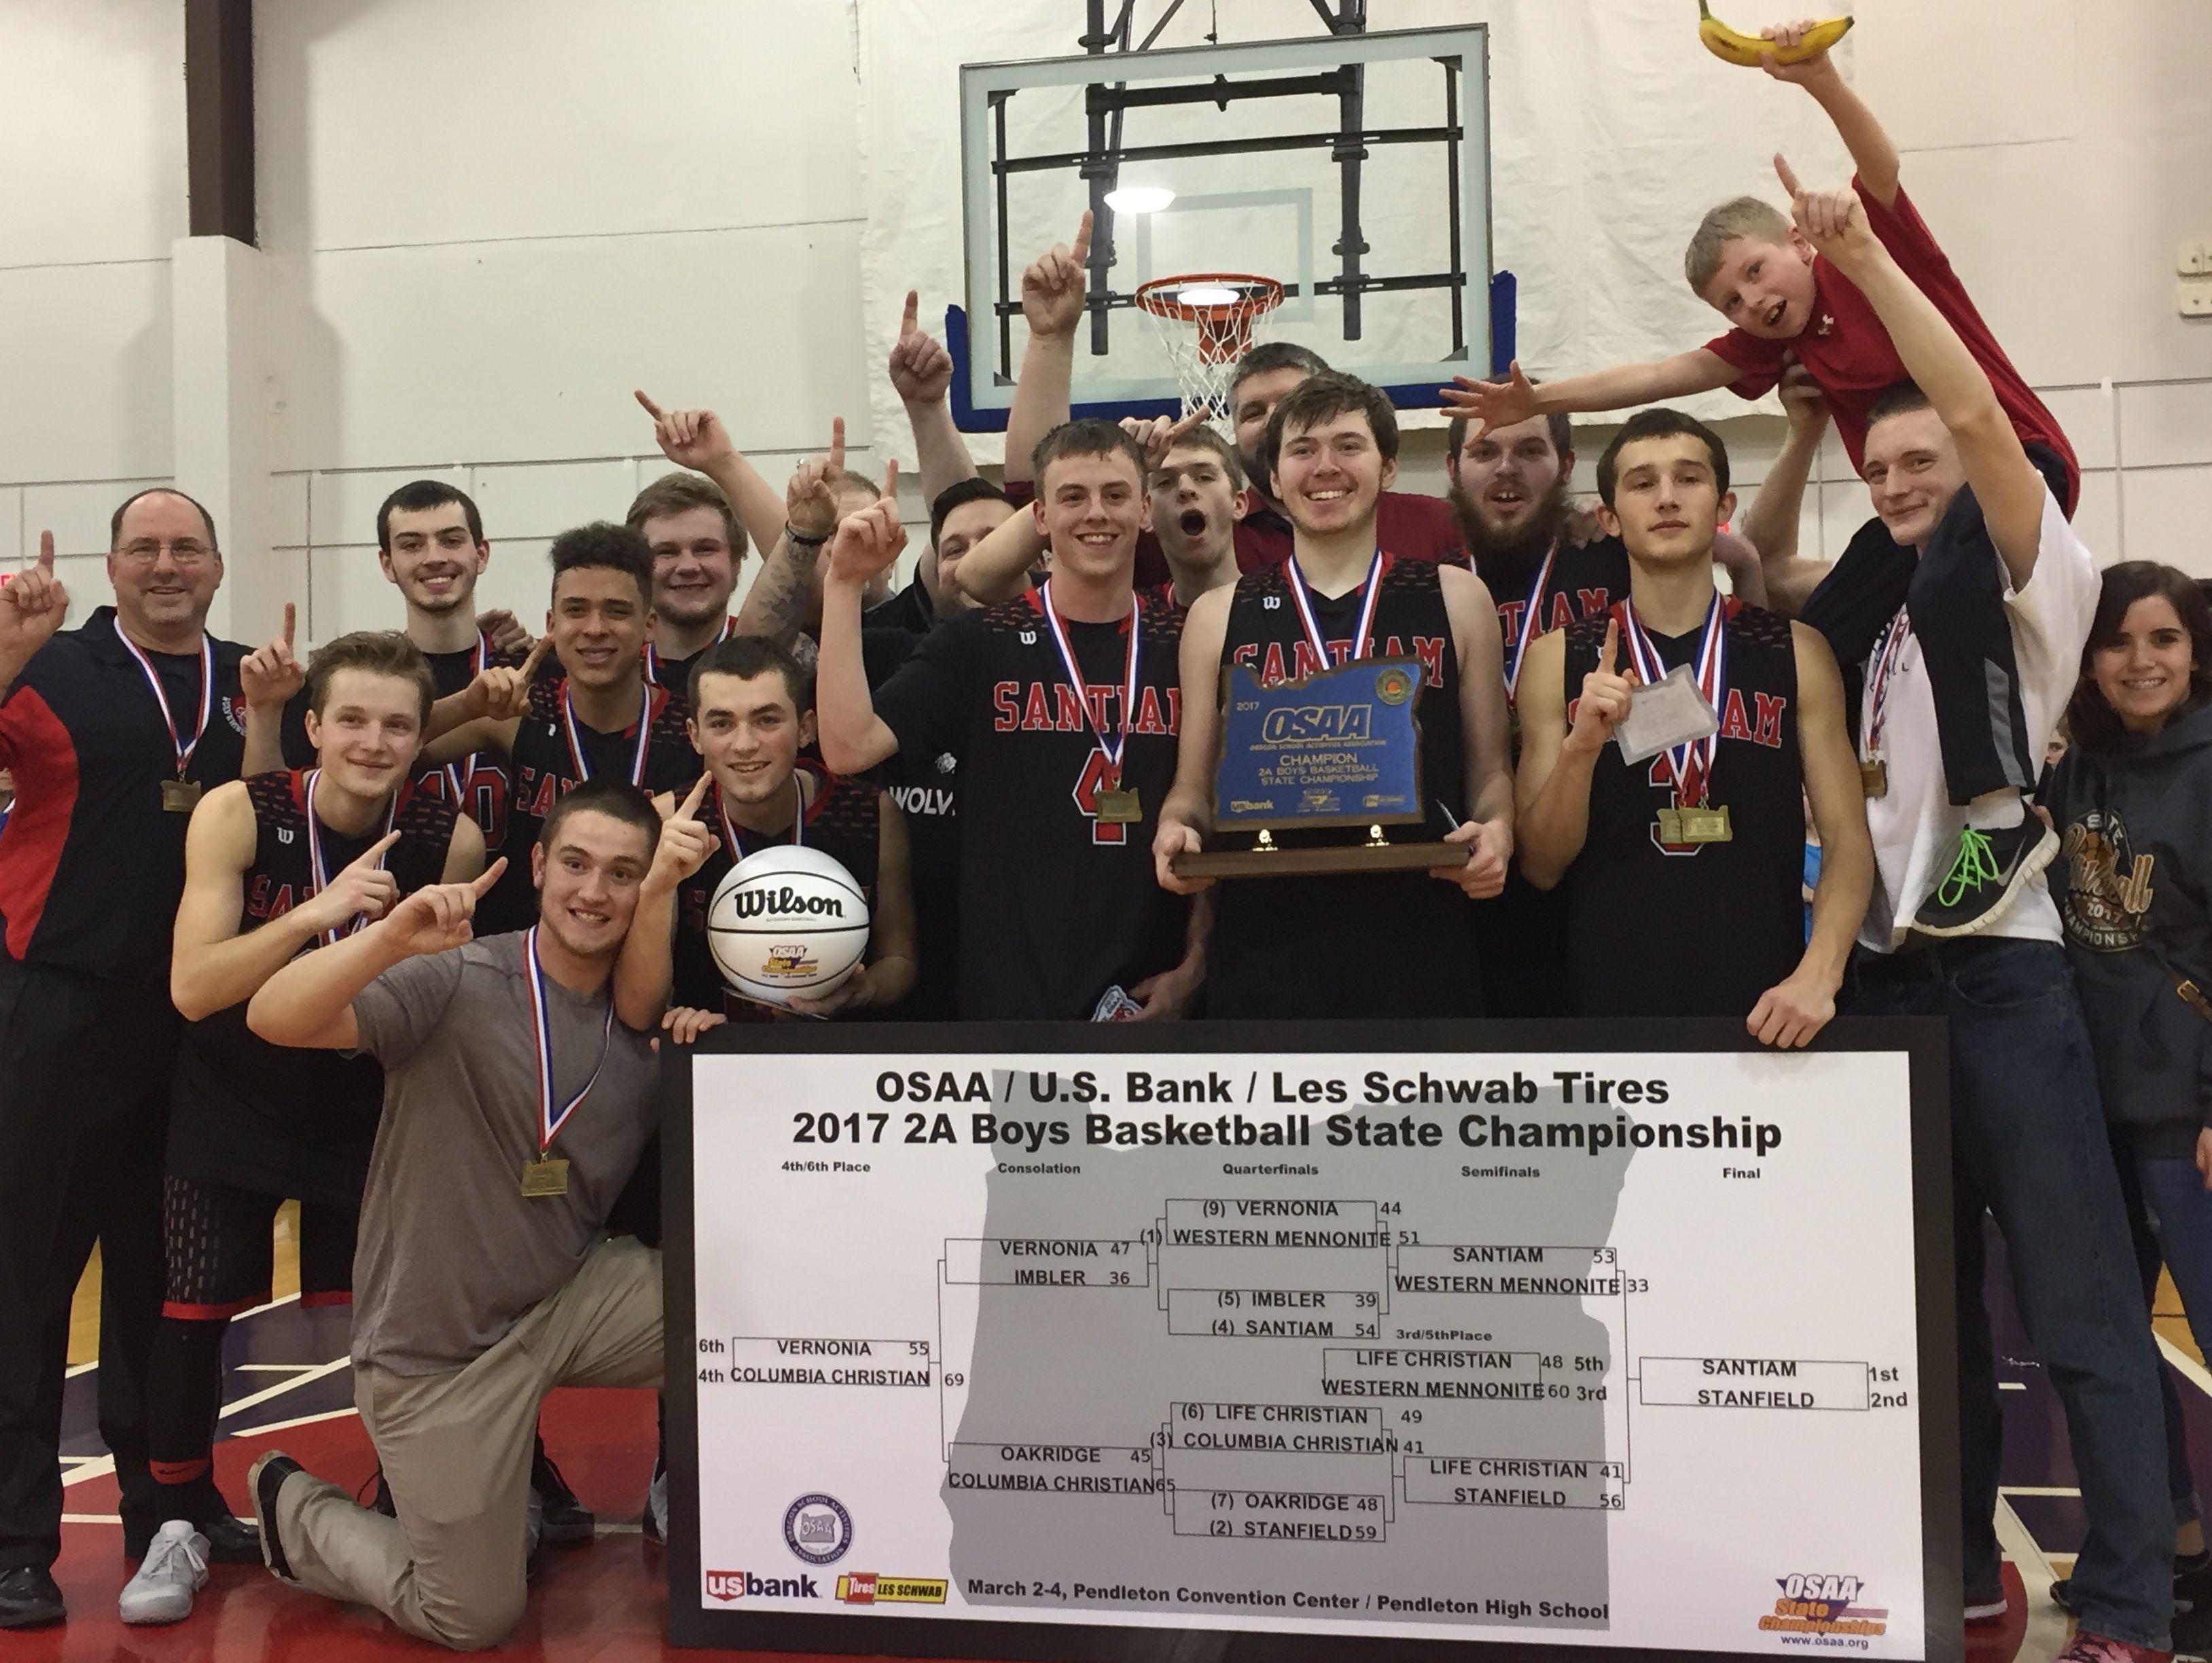 Santiam won its first boys basketball state championship since 1974.